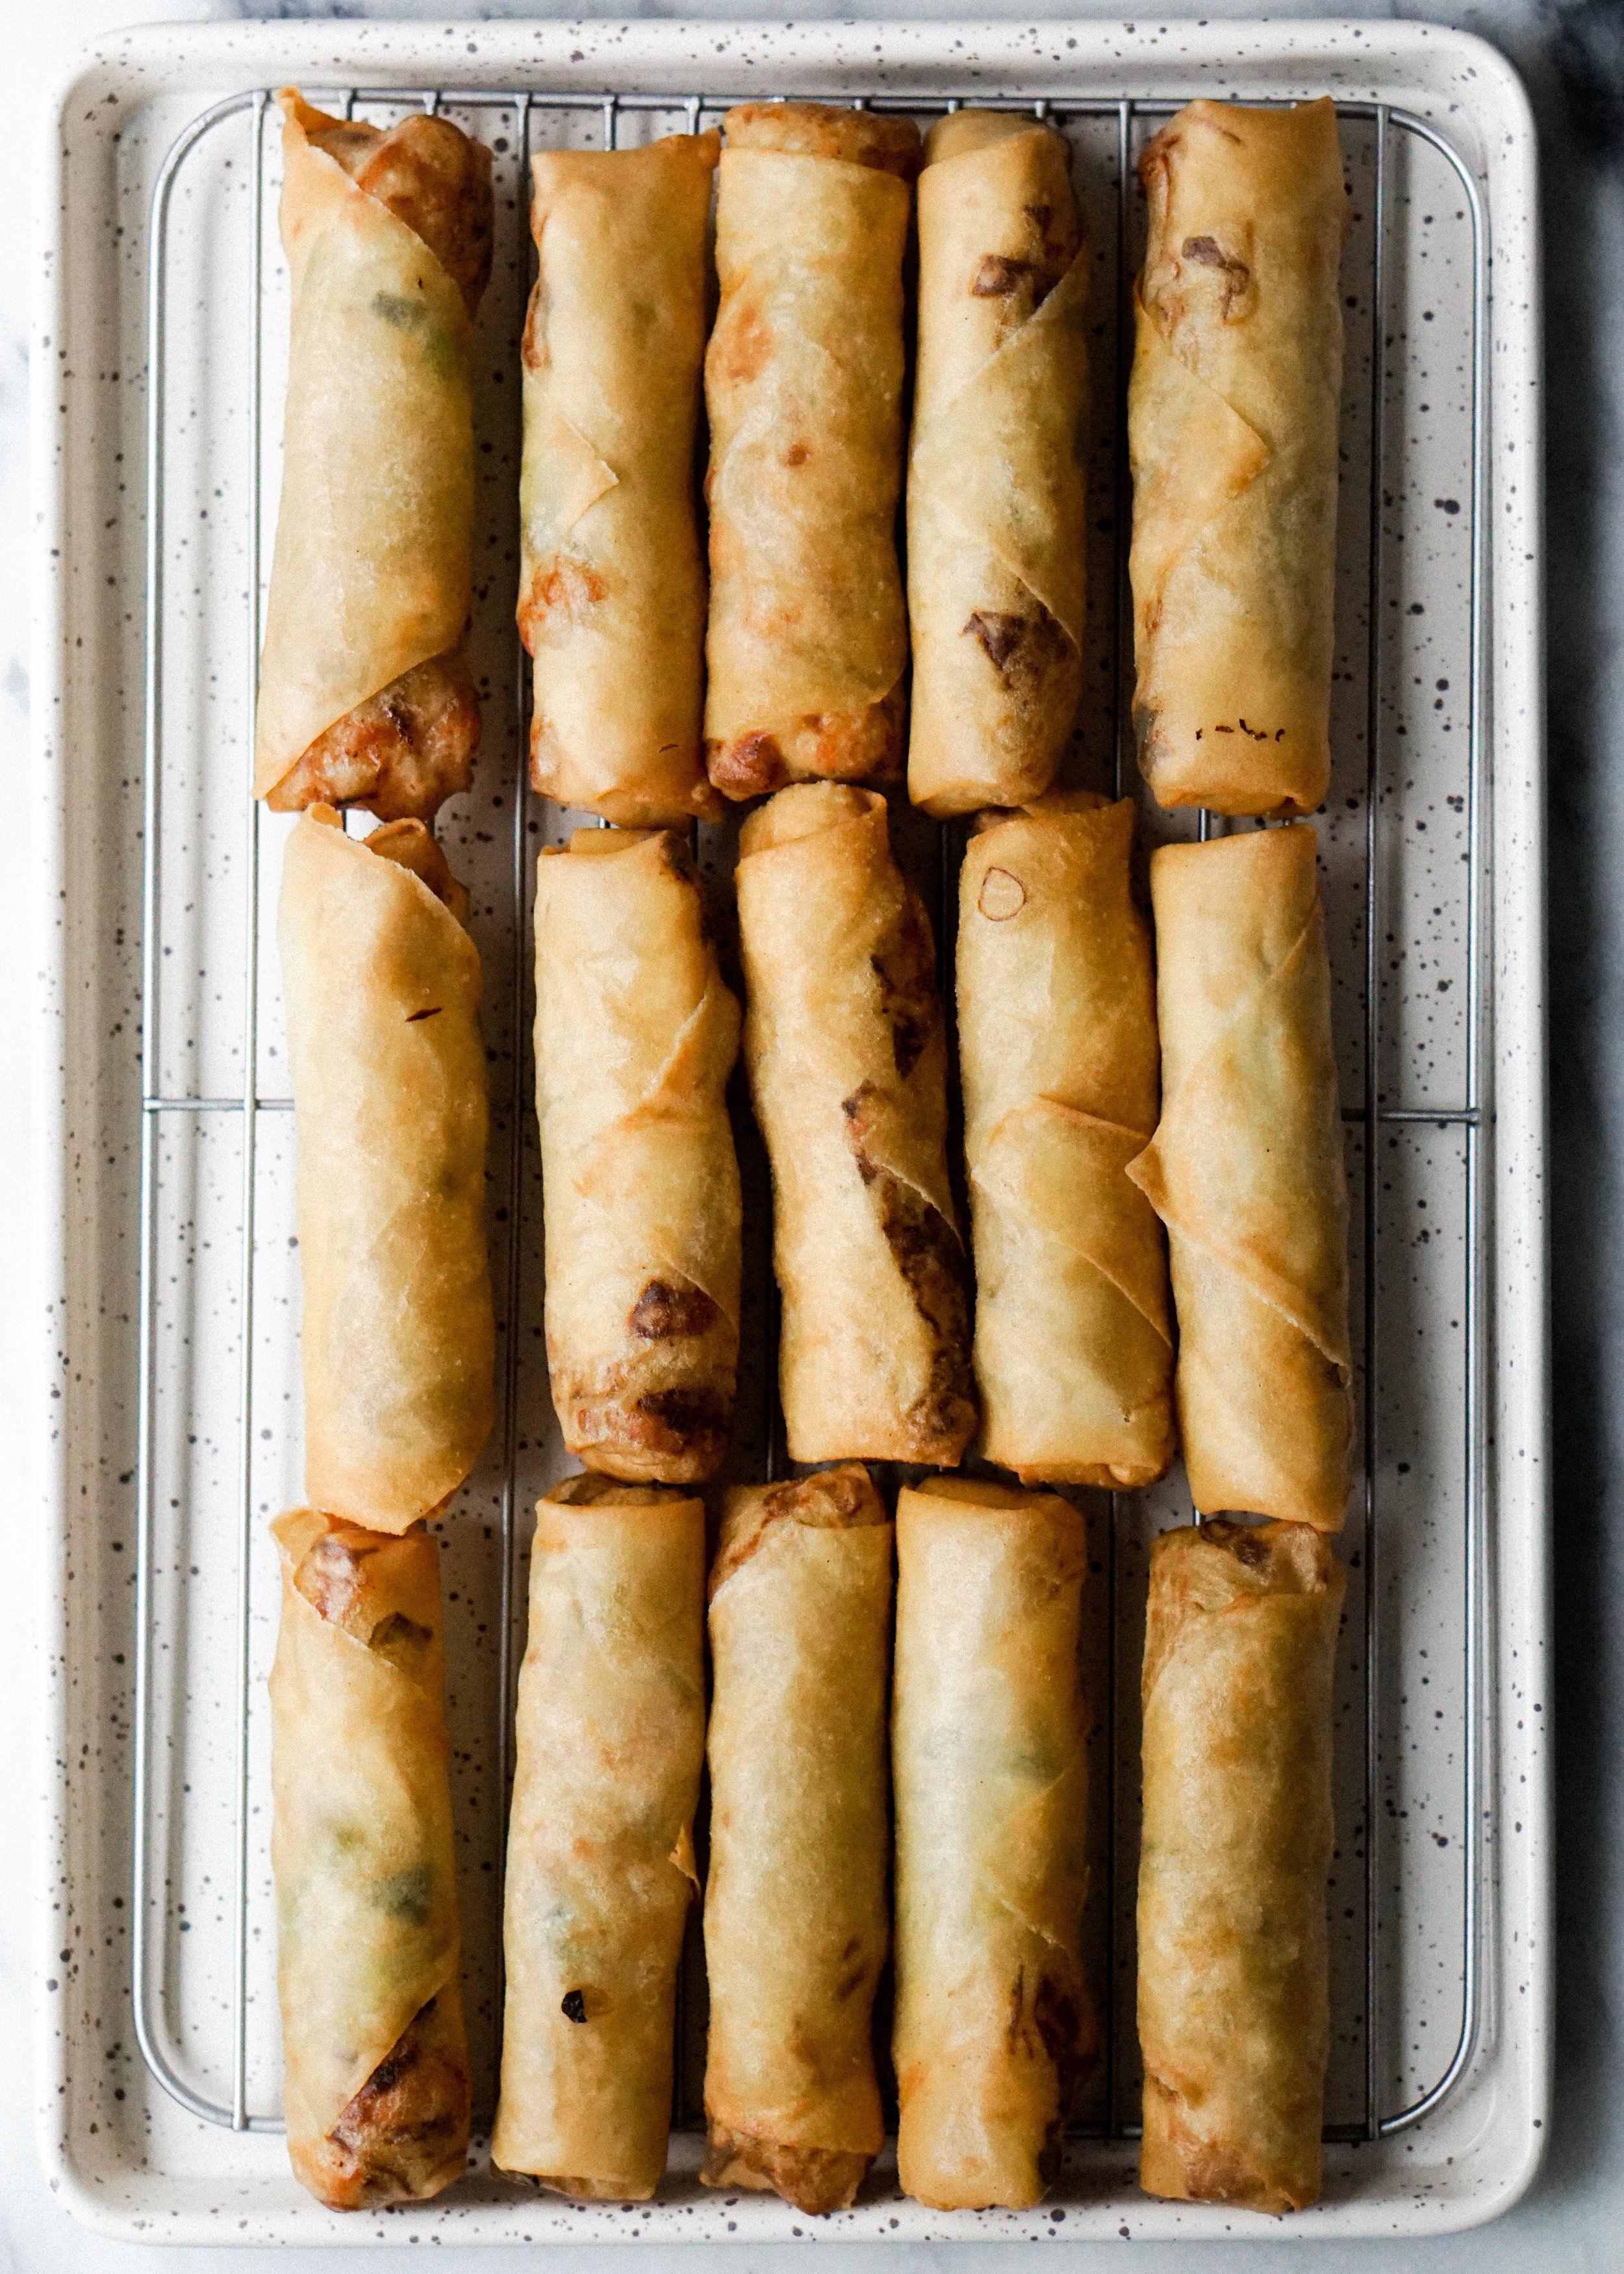 Chicken and Cabbage Spring Rolls // https://eatchofood.com/blog/2019/1/6/chicken-and-cabbage-spring-rolls